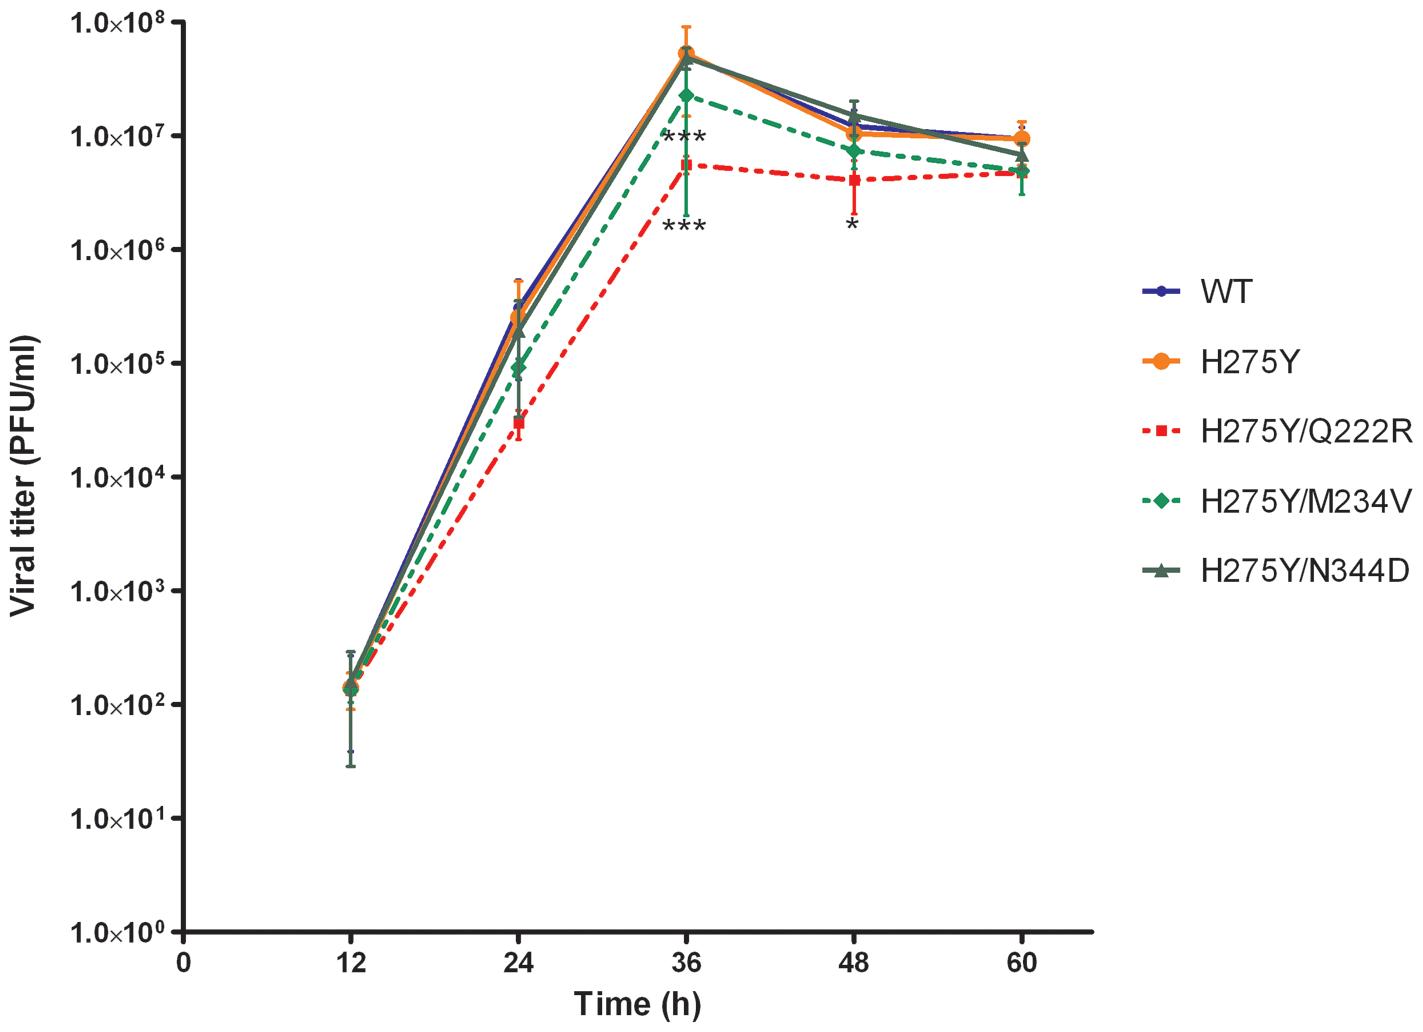 Replication kinetics of recombinant A/Brisbane/59/2007-like viruses <i>in vitro</i>.